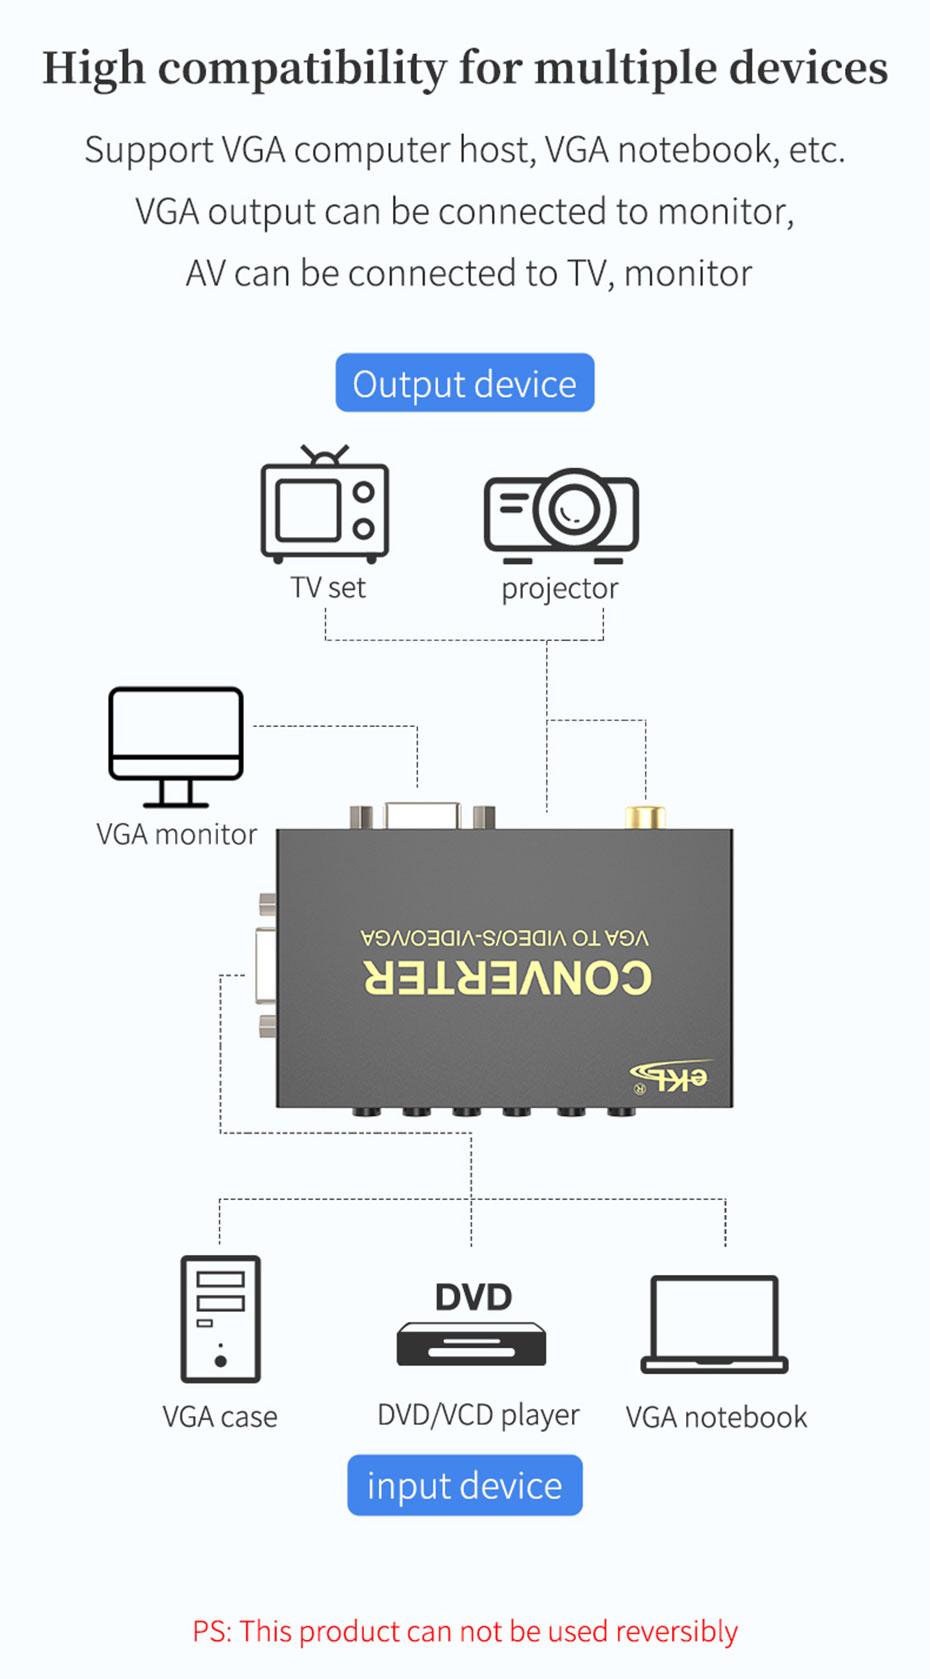 VGA to AV/S terminal/BNC converter 1801 compatible with VGA interface equipment